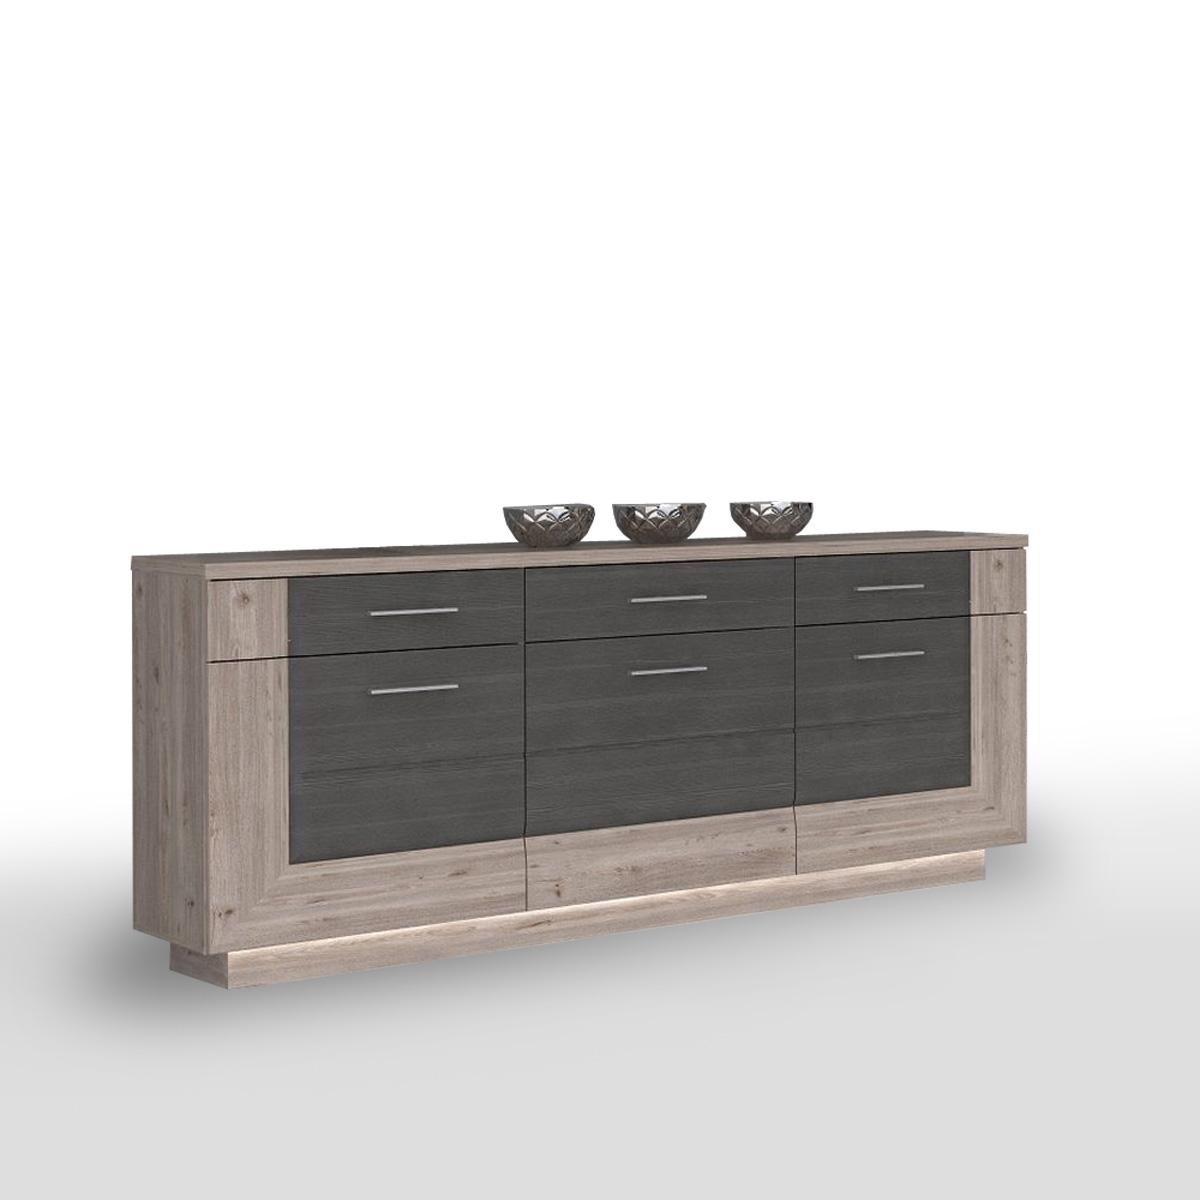 sideboard stairs kommode anrichte in nelsoneiche und eiche grau inkl led ebay. Black Bedroom Furniture Sets. Home Design Ideas